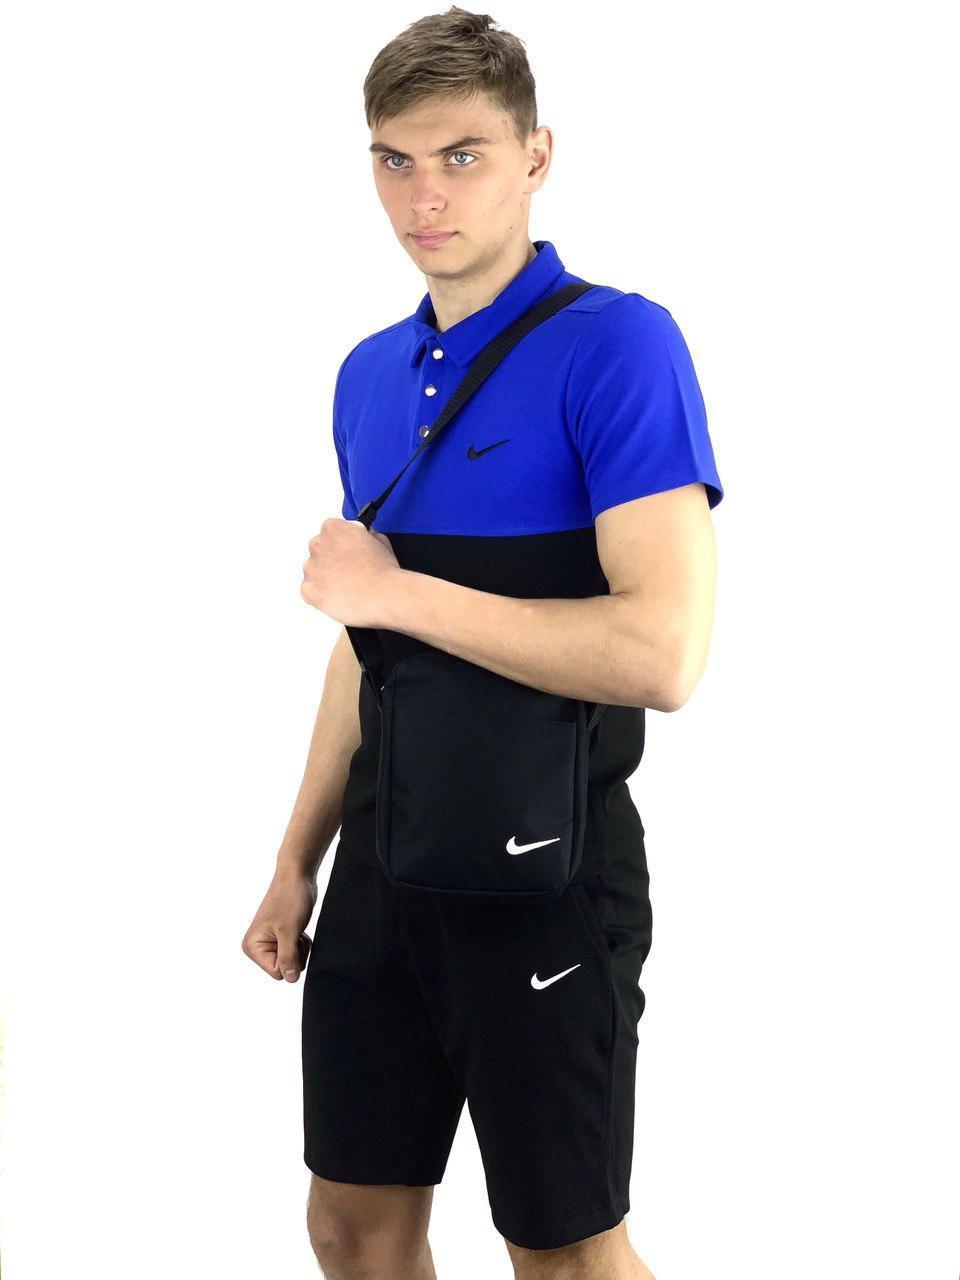 Футболка Поло черная-синяя + Шорты + Барсетка  в стиле Nike (Найк) Костюм летний